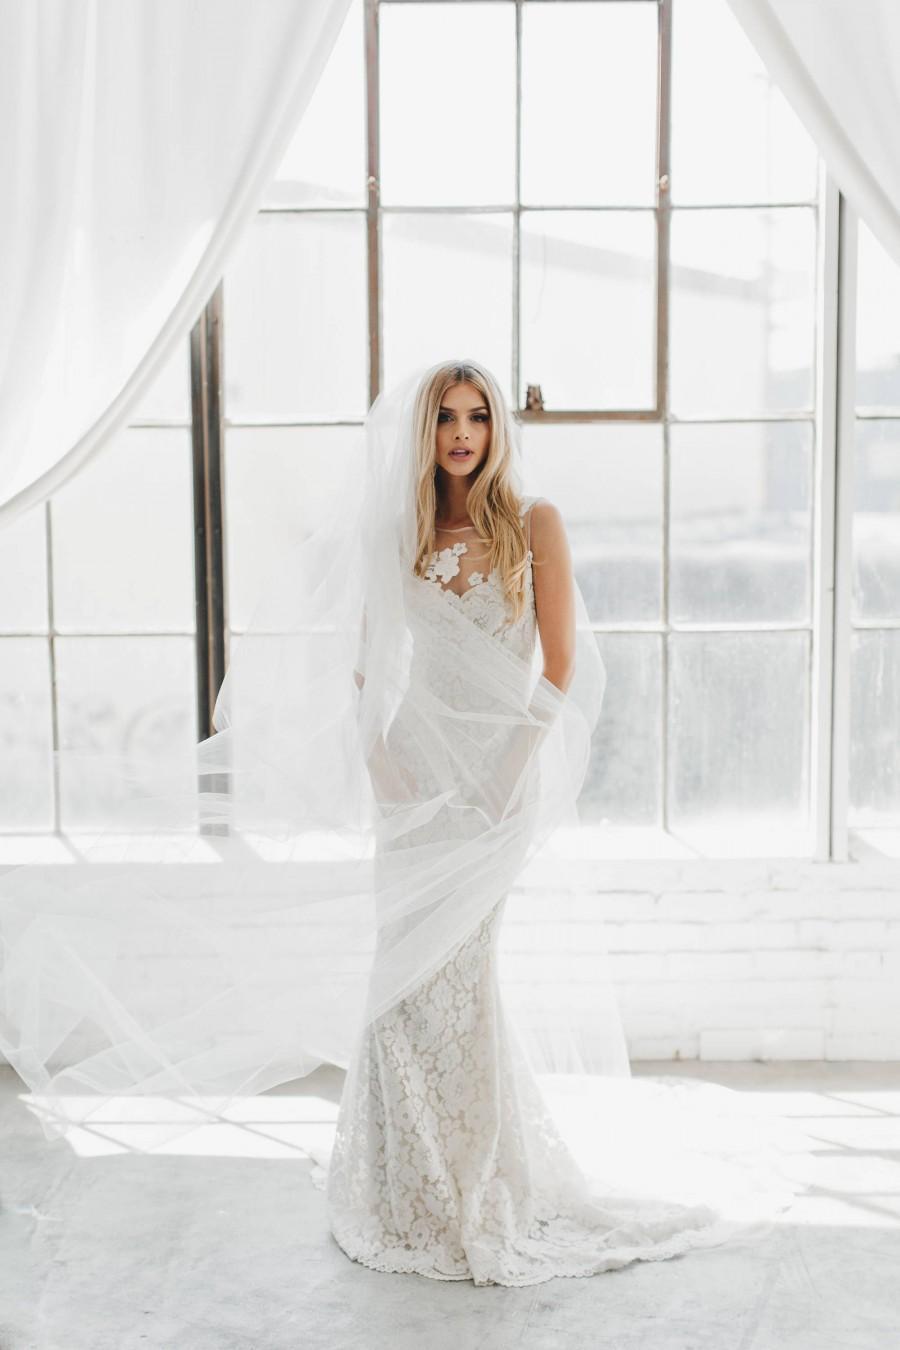 Mariage - Soft Wedding Veil, Soft Tulle Veil, Ivory Cathedral Veil, Ivory Simple Veil, Fingertip Length Bridal Veils, Flower Crown Veil Soft Veil 0802